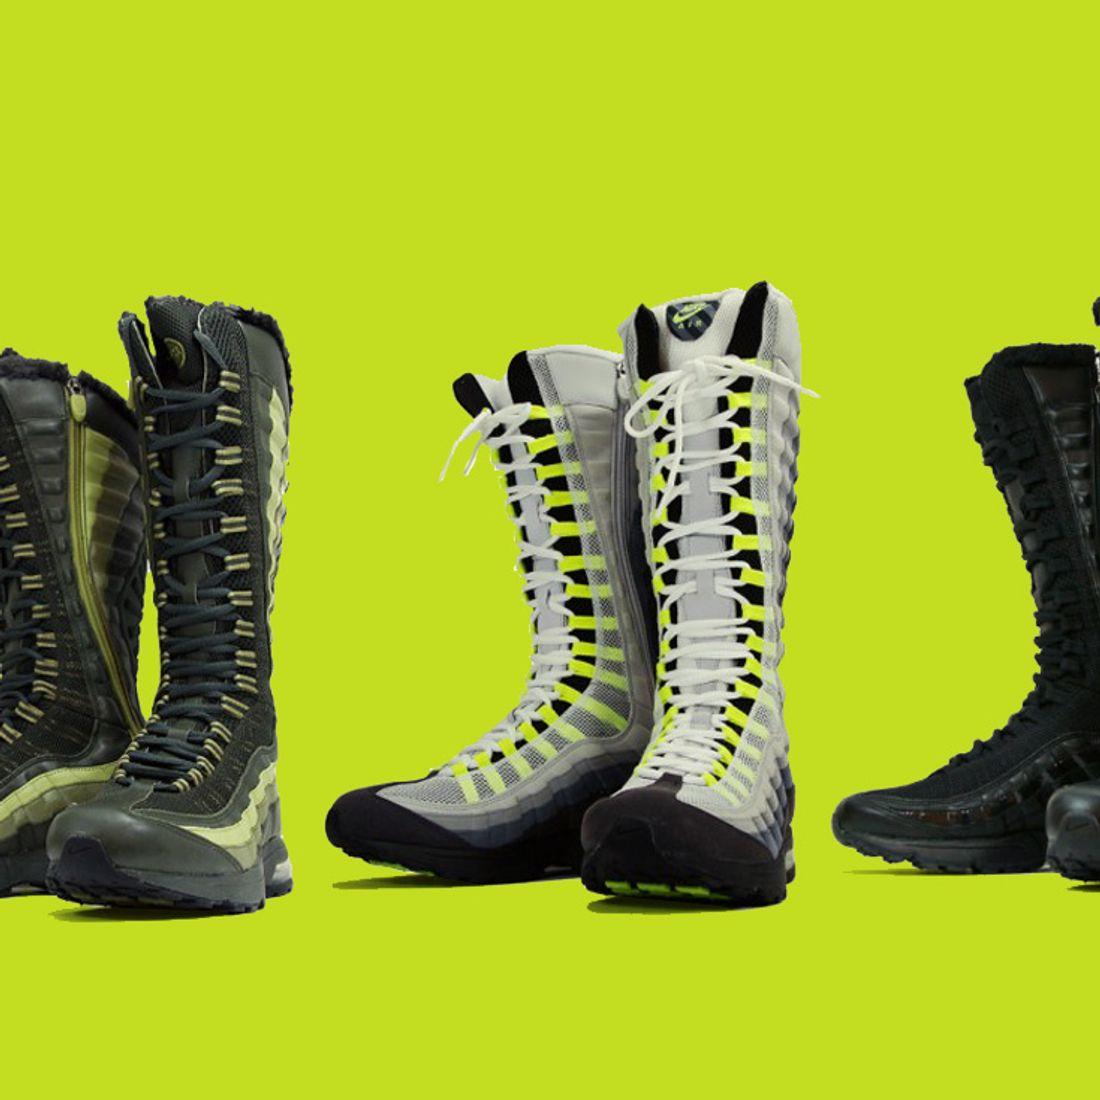 Confundir Patria Violeta  Forgotten Grails: Obscure Mid-2000s Nike Air Max Sneakers - Sneaker Freaker